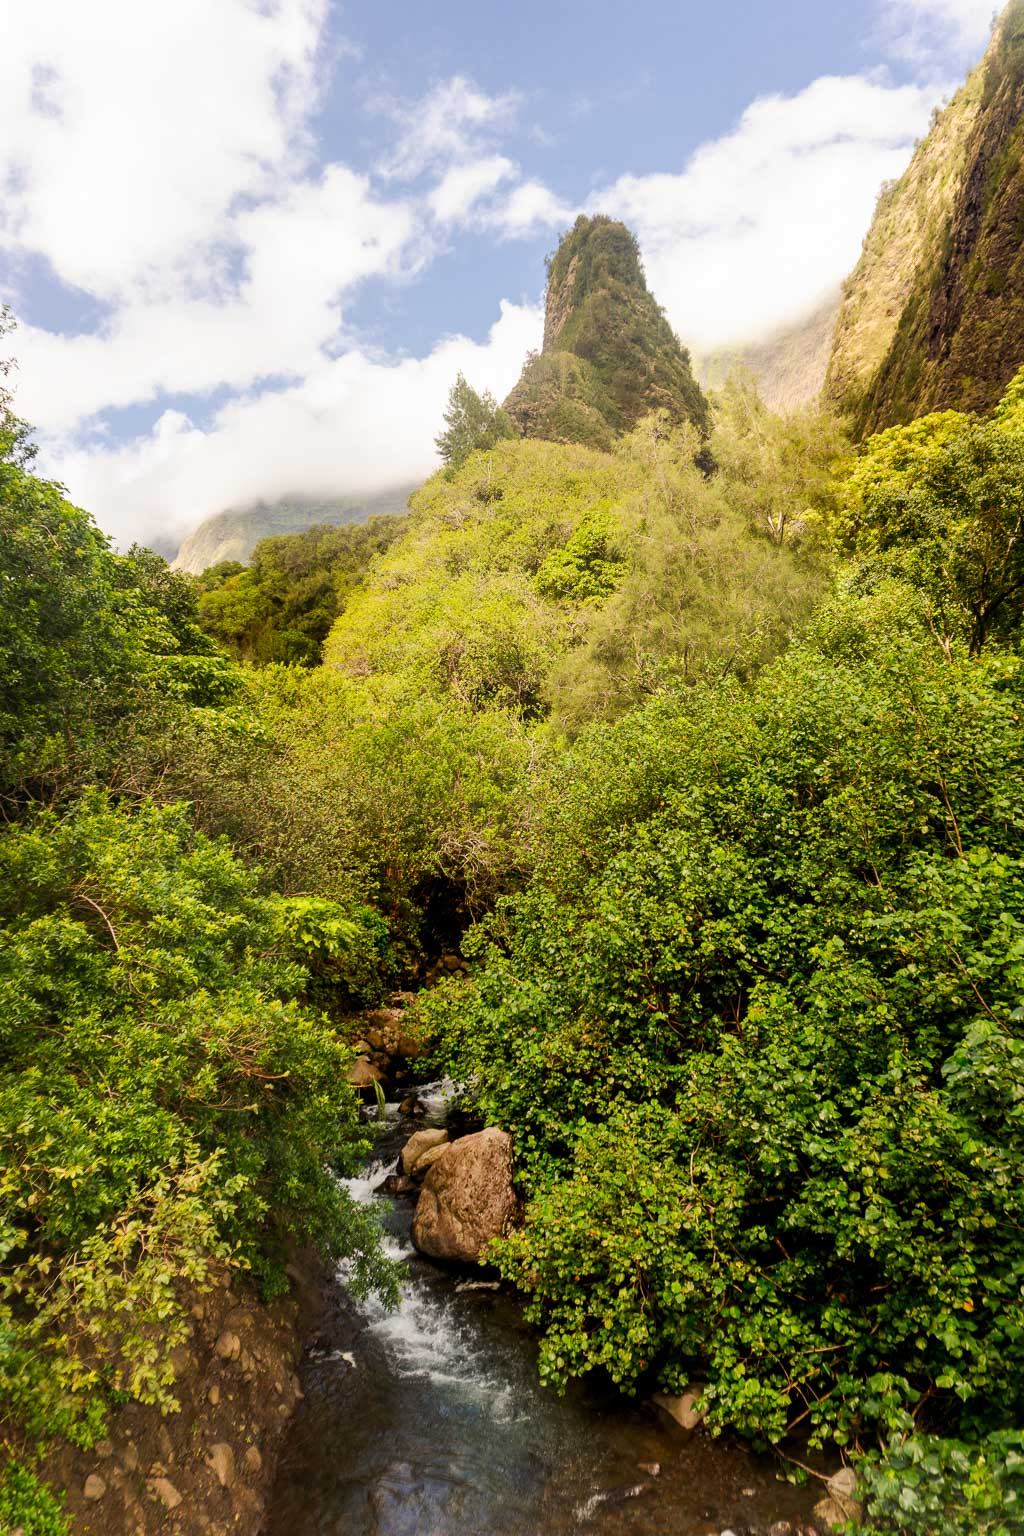 Iao Valley Needle, Napili, Maui